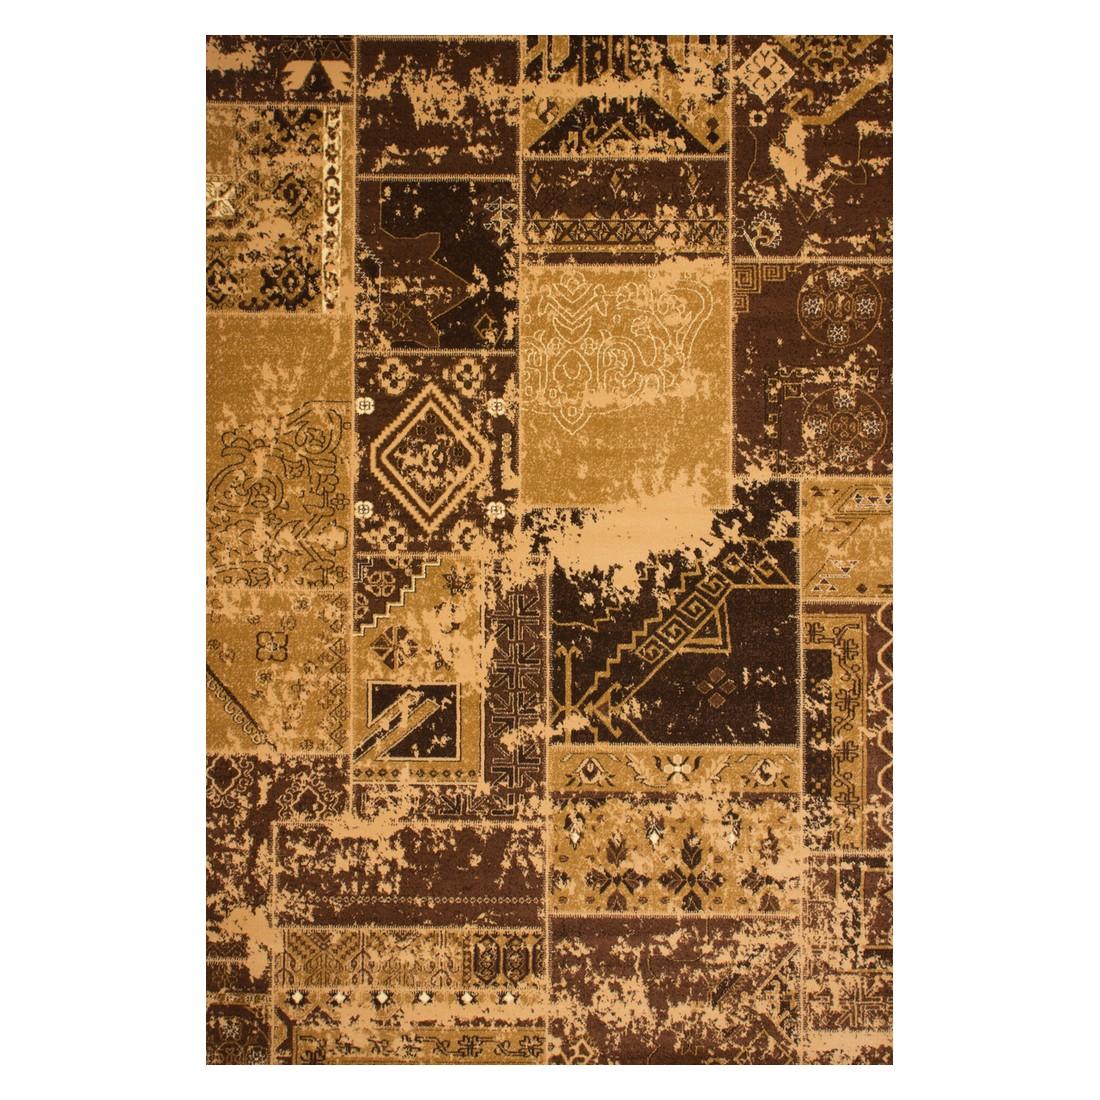 Teppich Retro - Beige - 80 x 150 cm, Obsession